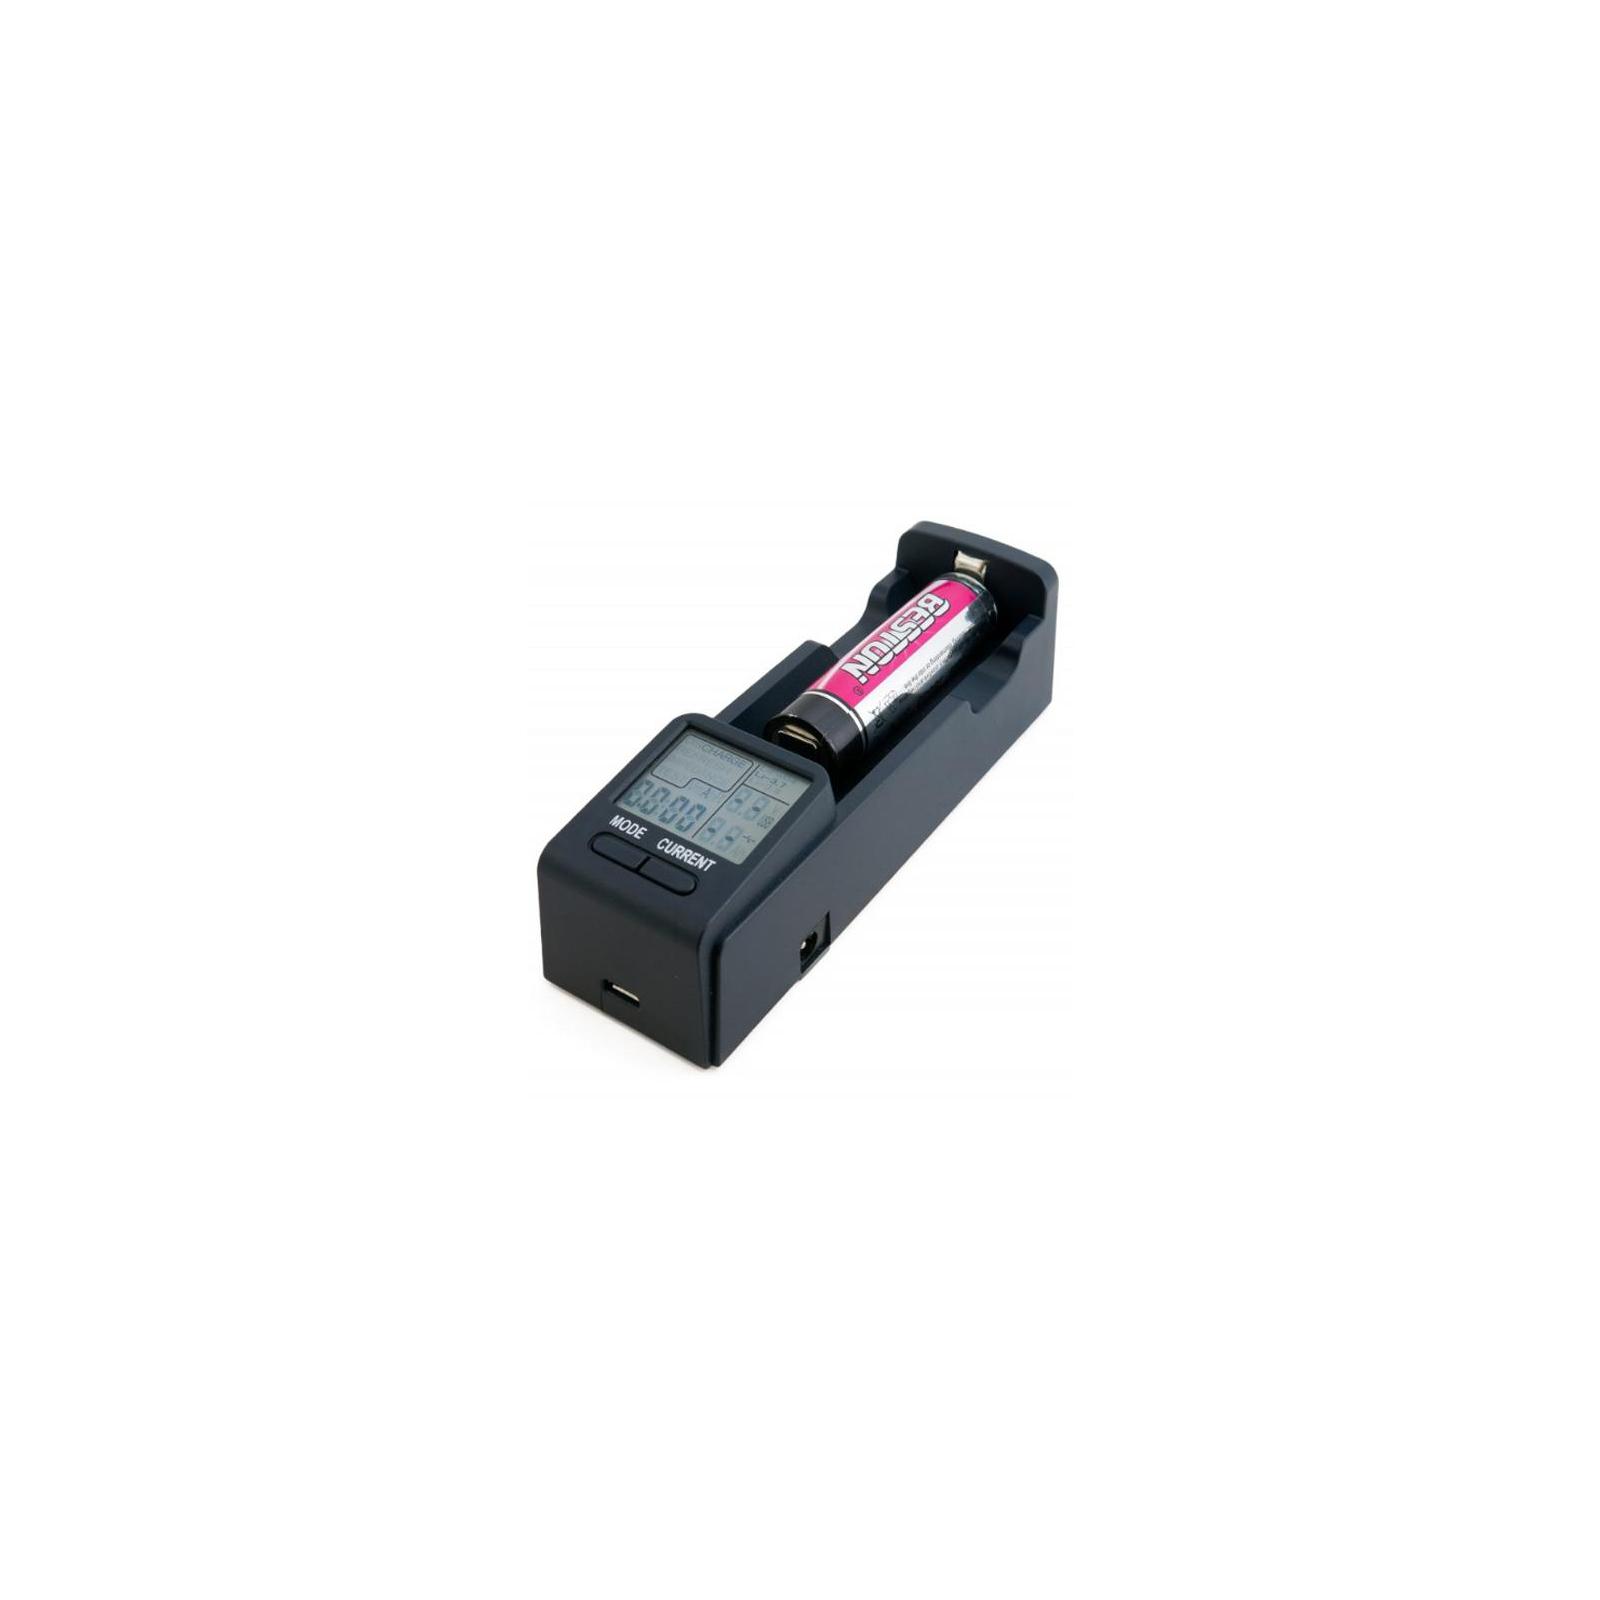 Зарядное устройство для аккумуляторов Extradigital BTC10 Travel 1slot Li-ion, Ni-MH, Ni-CD, LiFePO4 (AAC2832) изображение 4